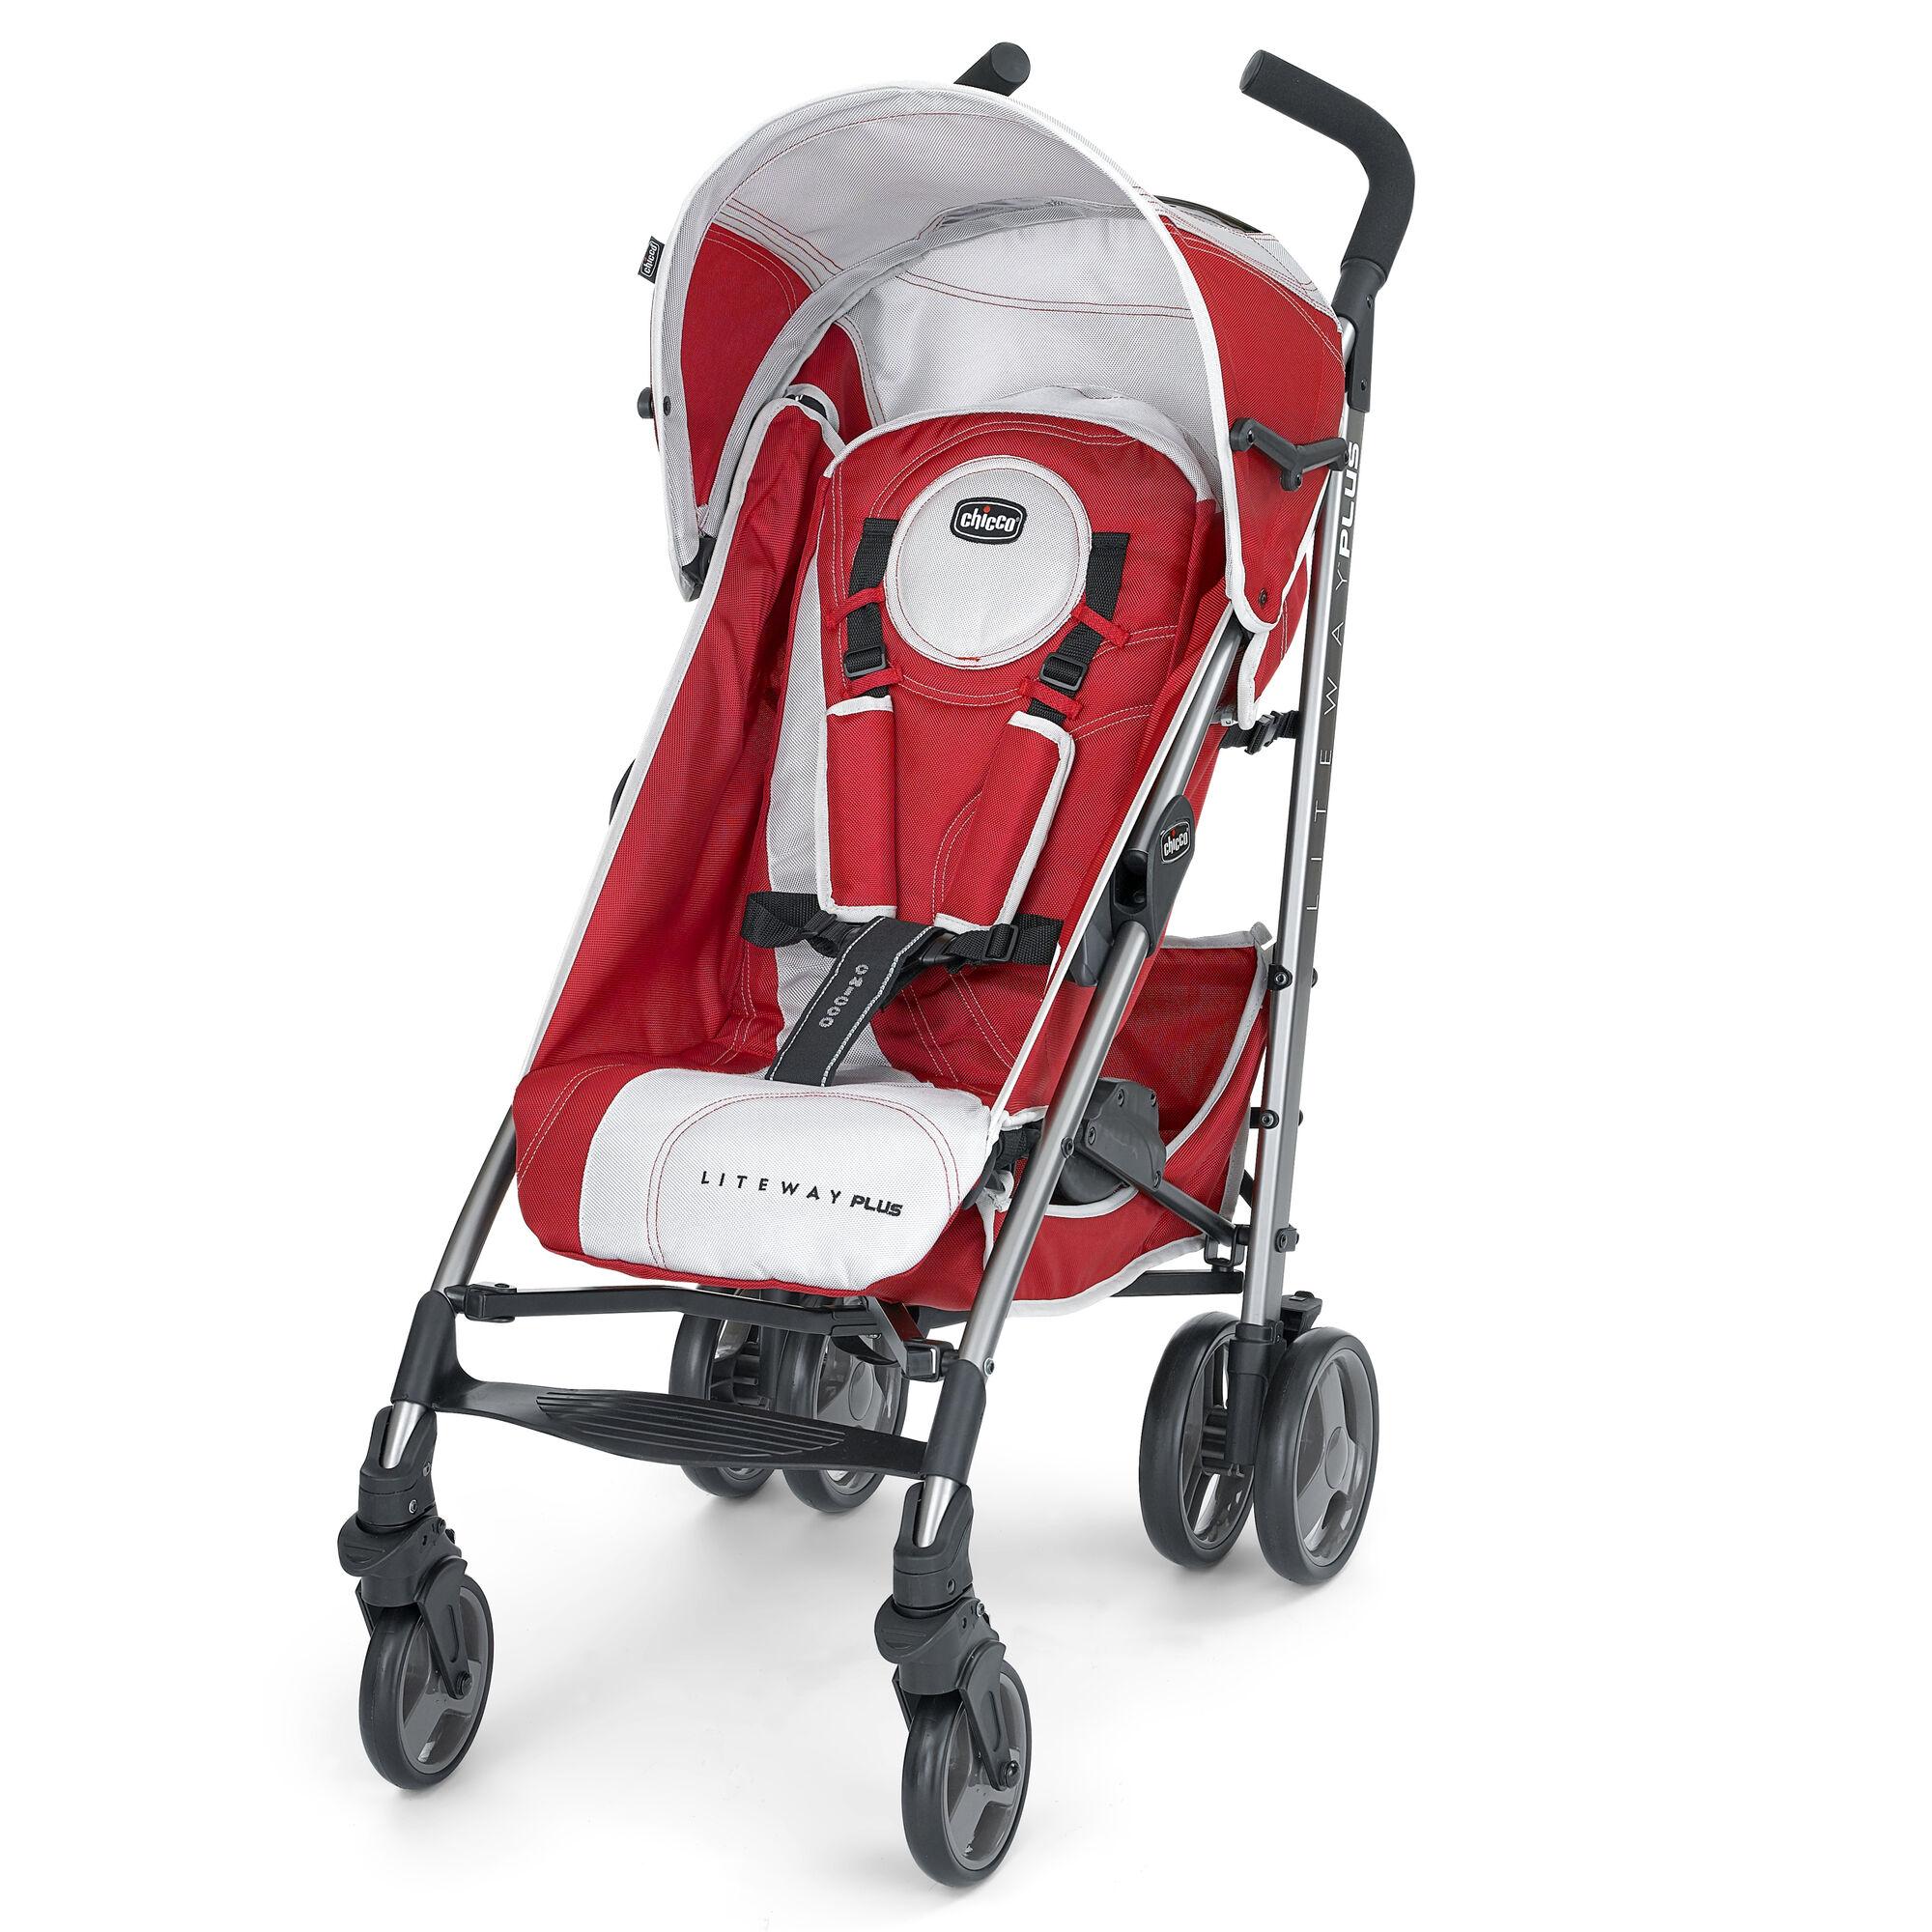 Chicco Liteway Plus 2-in-1 Stroller - Snapdragon